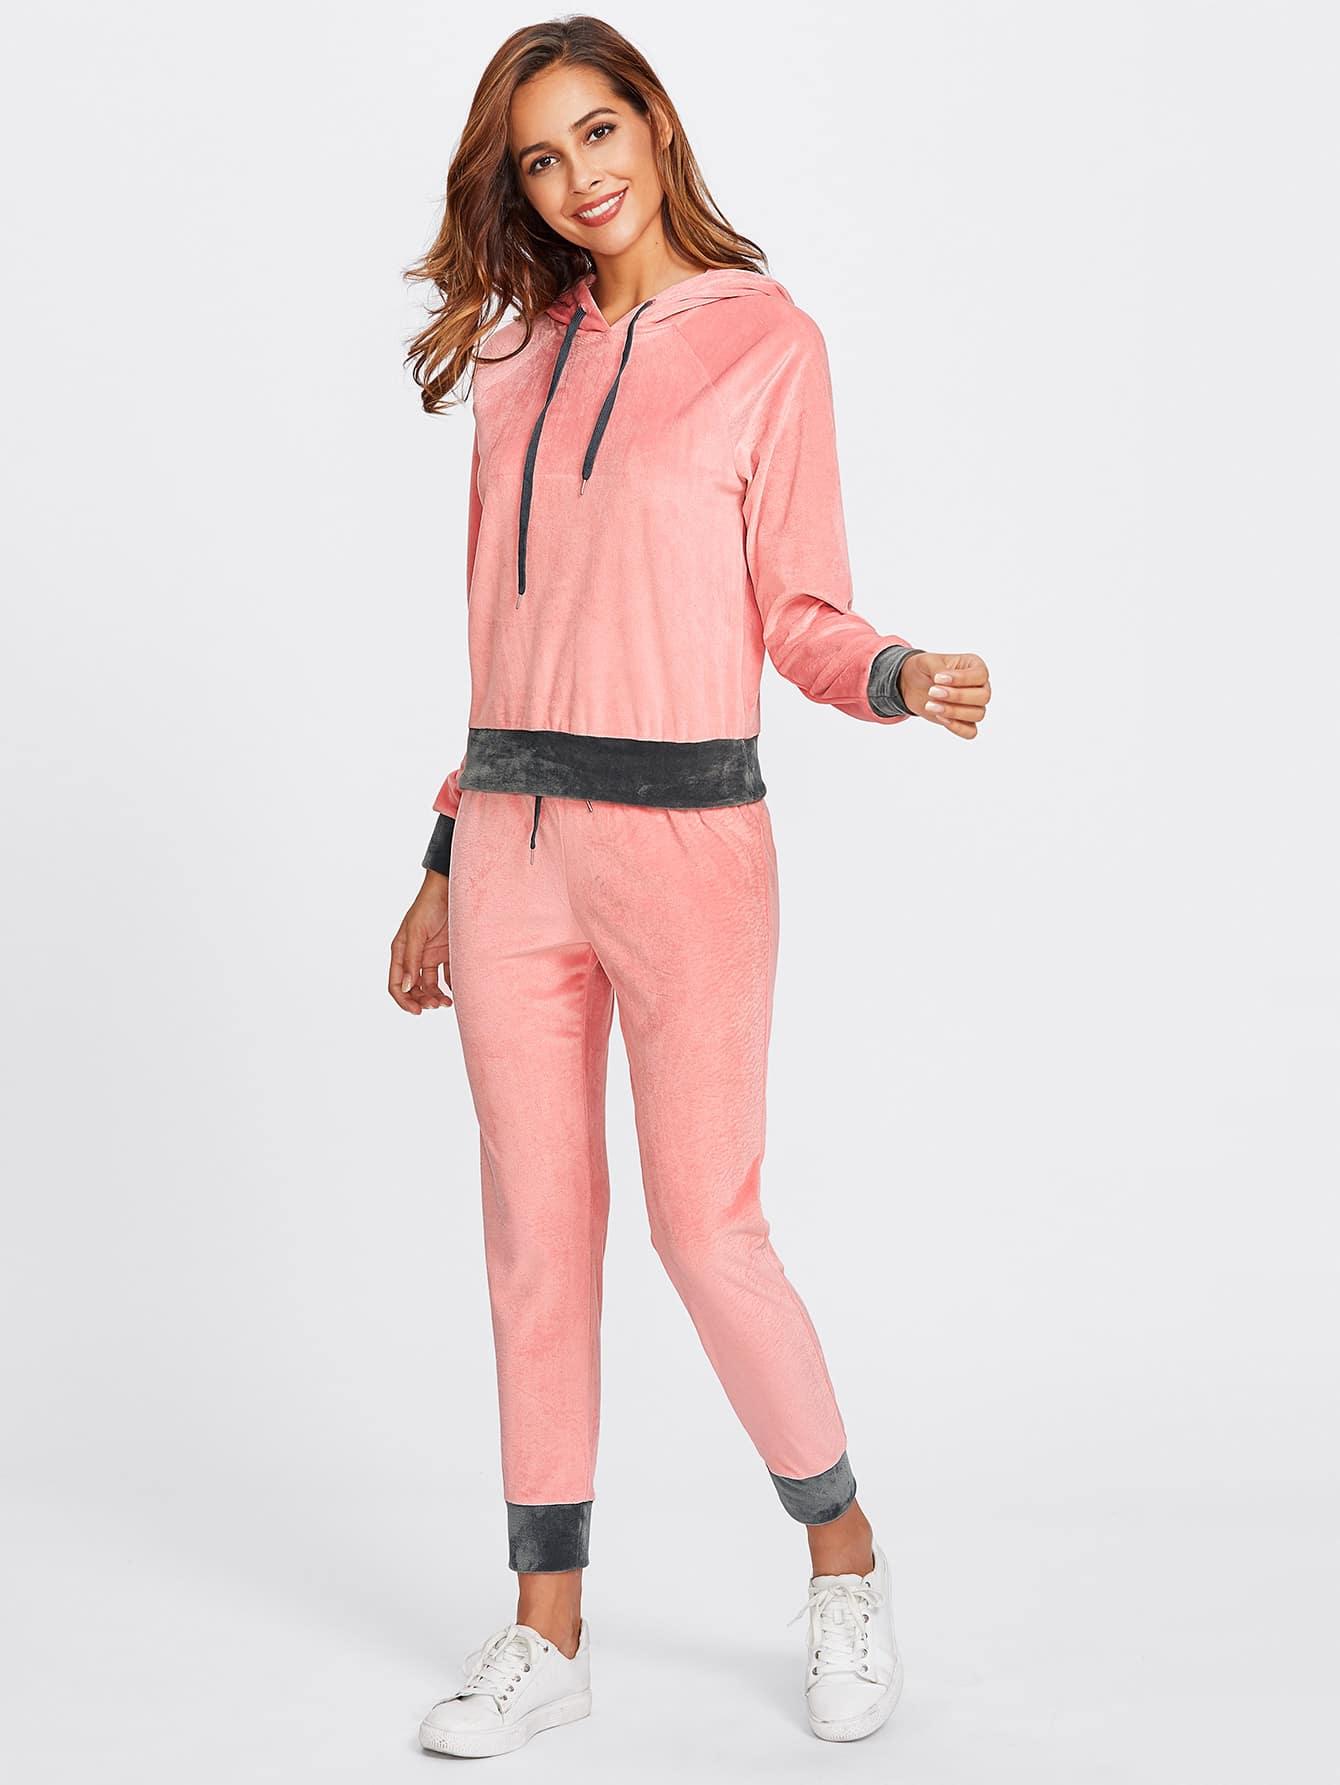 Contrast Trim Velvet Hoodie & Sweatpants Set twopiece170921702